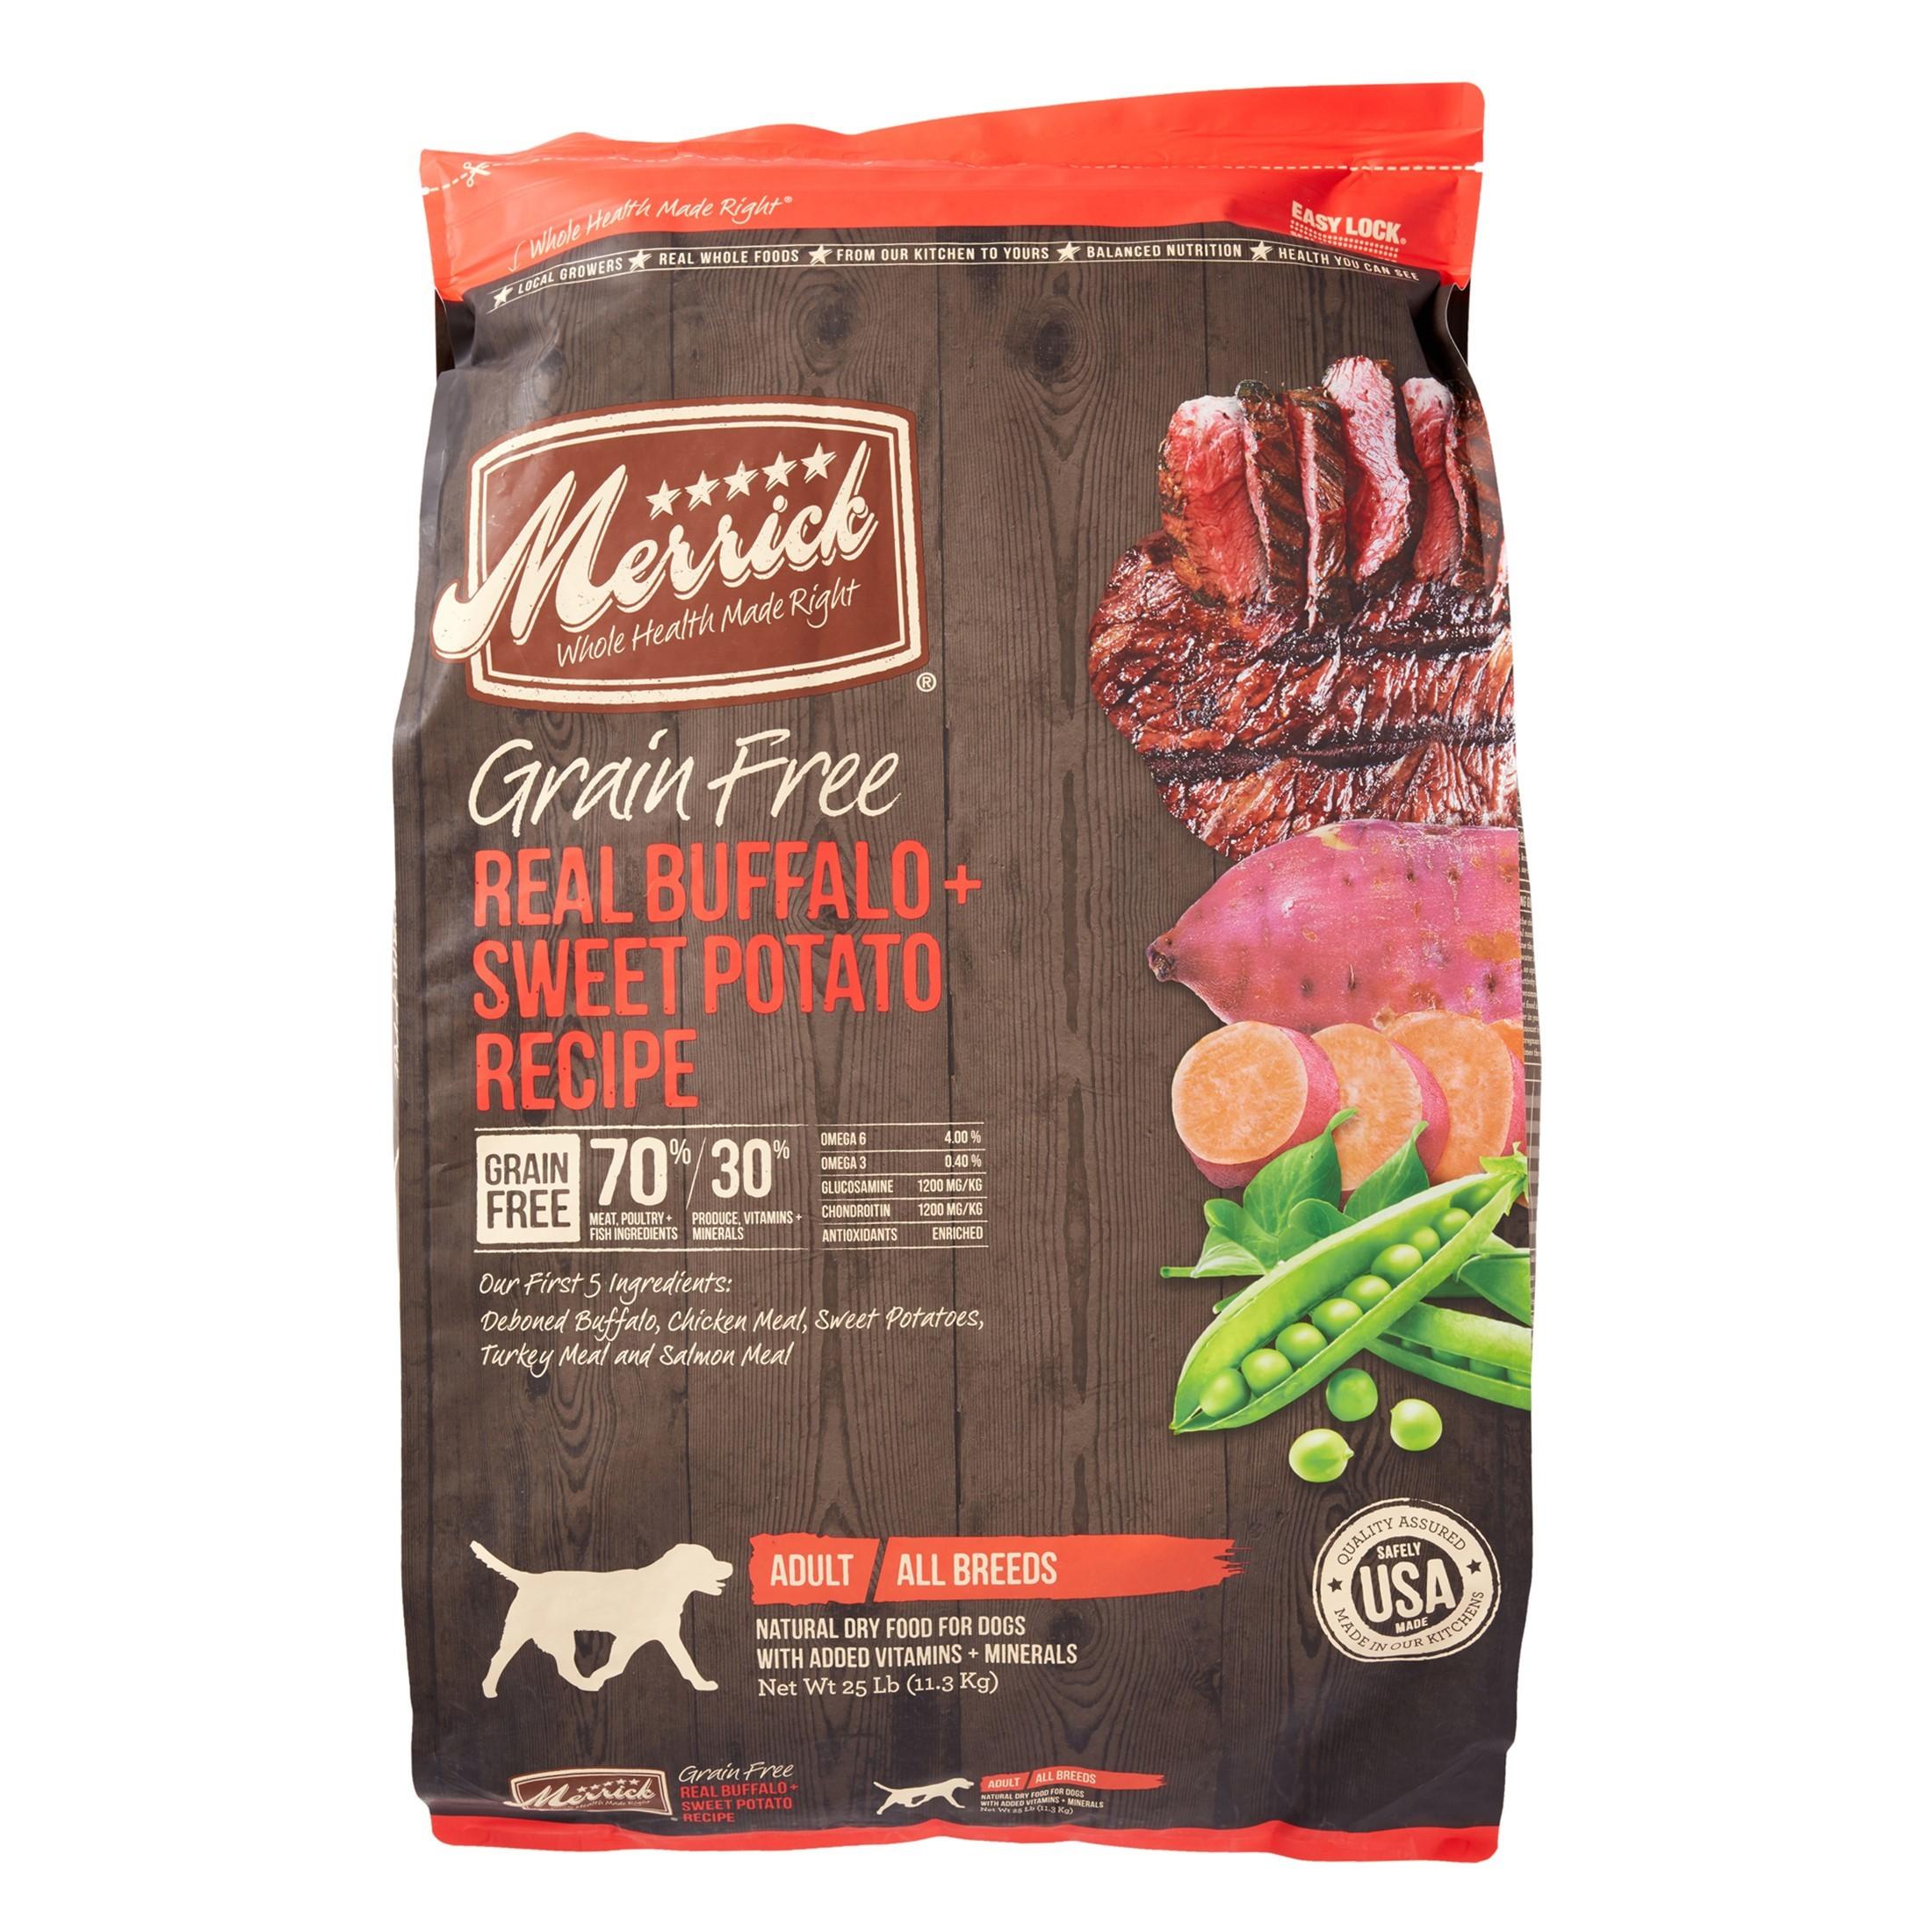 Merrick Grain-Free Real Buffalo & Sweet Potato Recipe Dog Food, 25 Lb